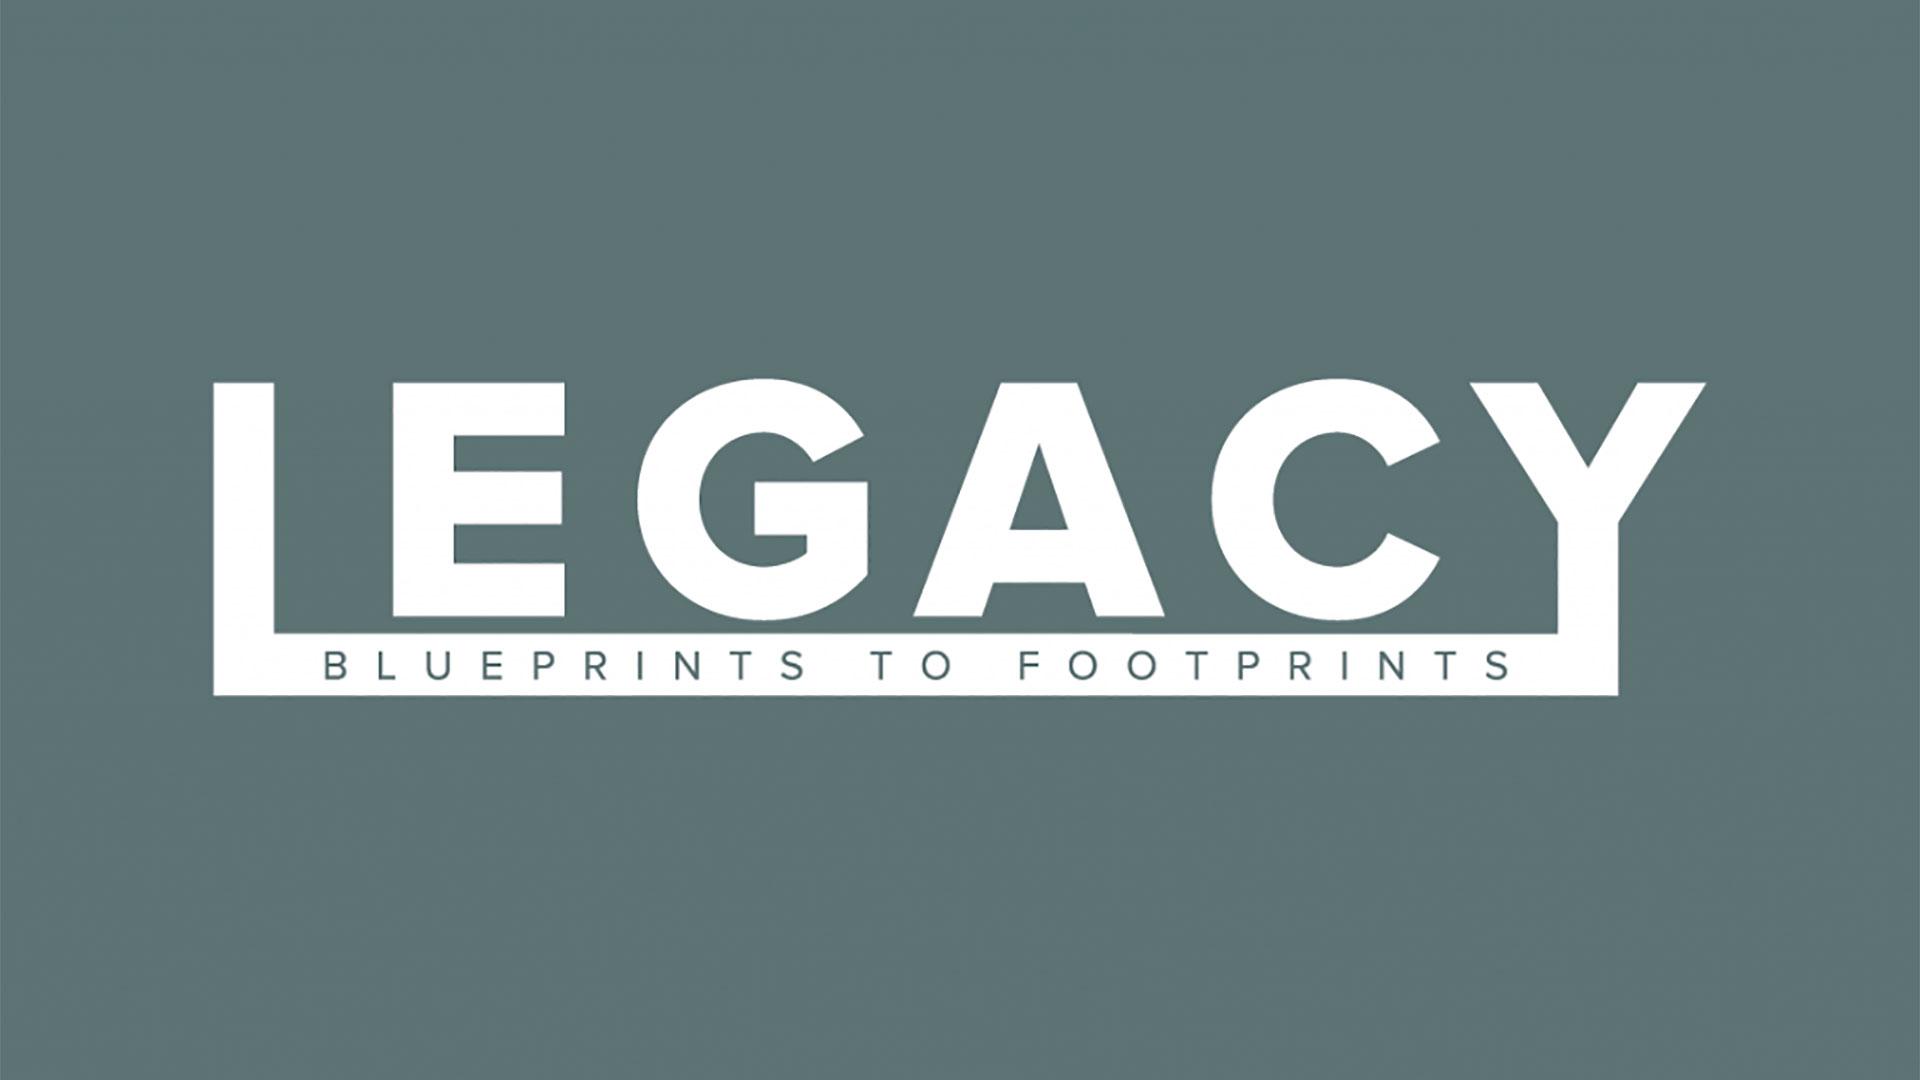 Series: Legacy